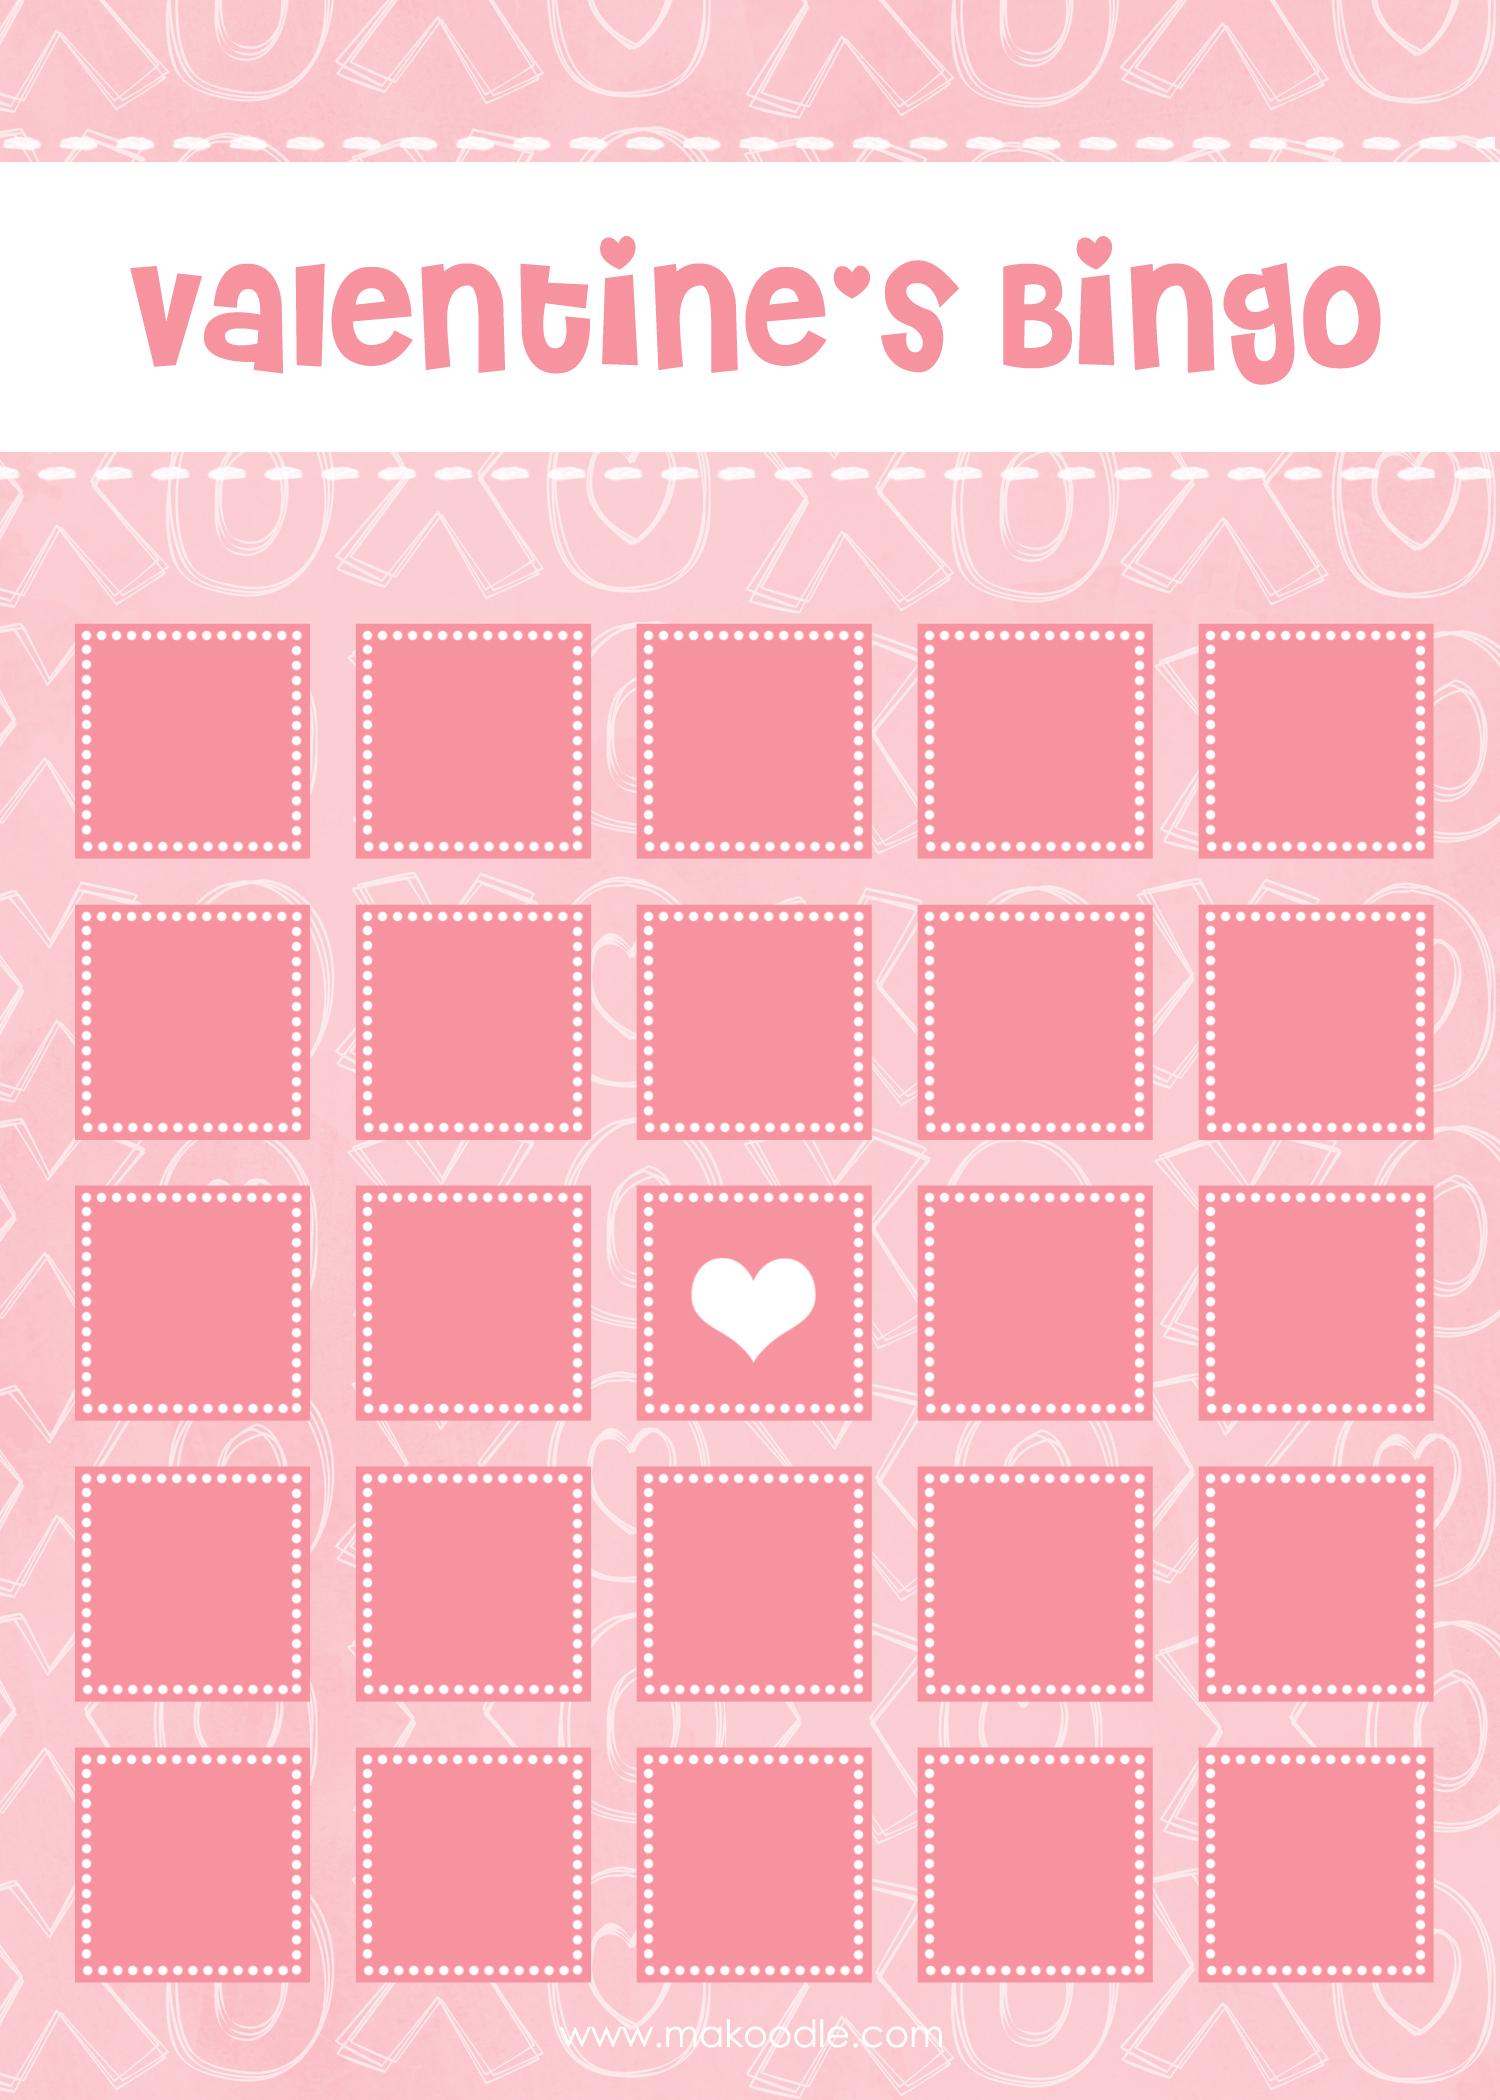 Valentine's Bingo - Free Printable Download - Makoodle